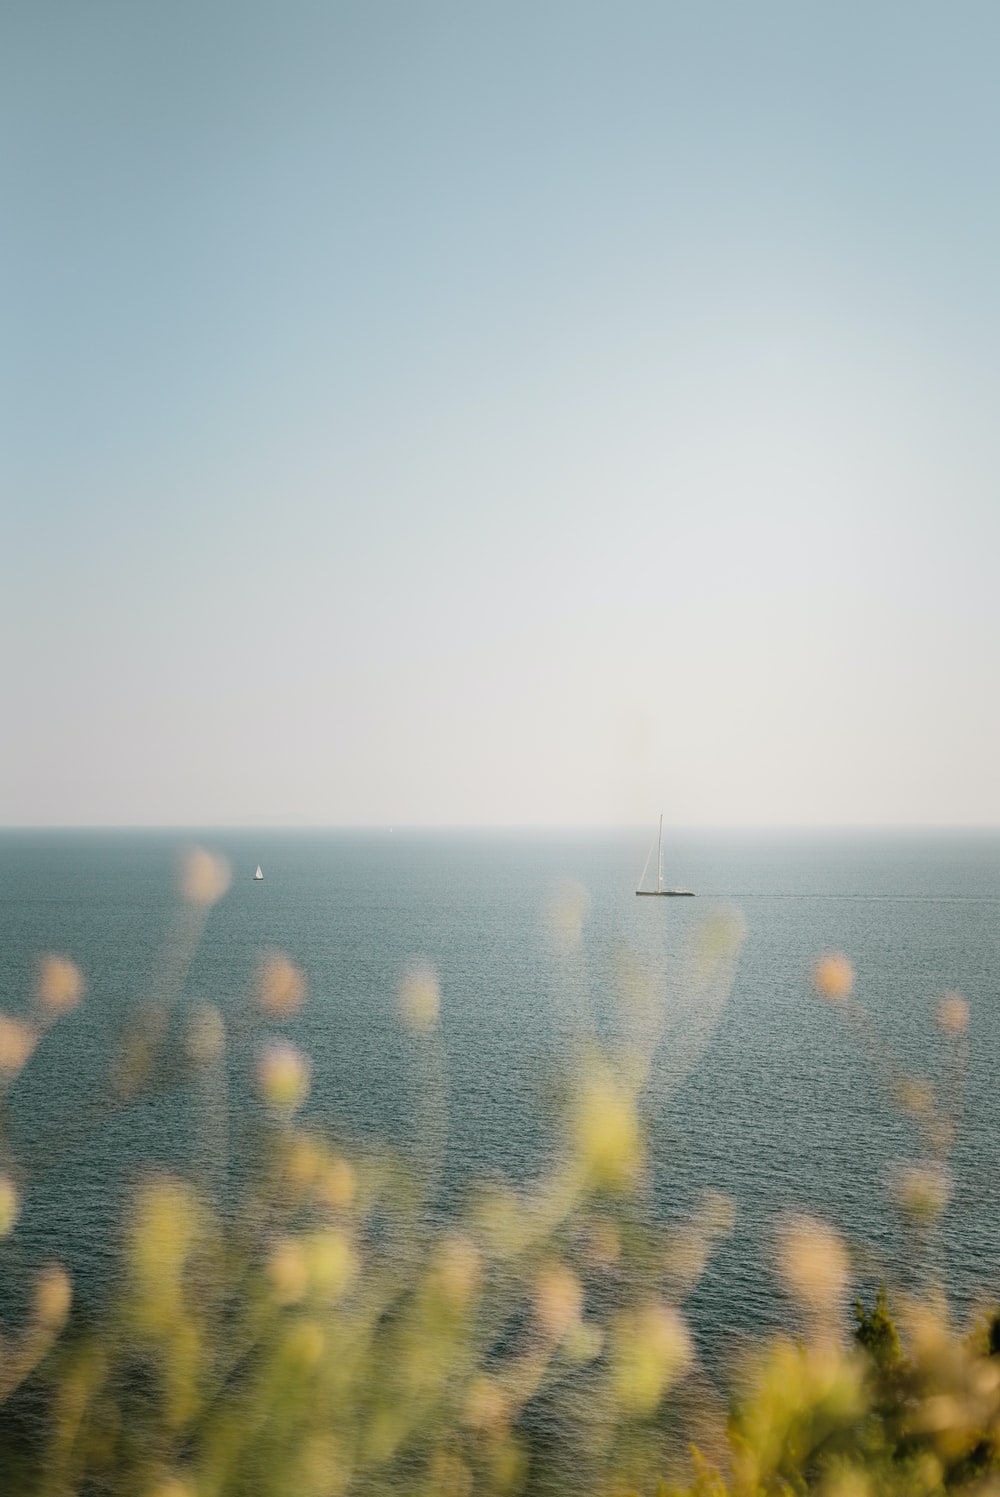 schooner boat on calm sea during daytime